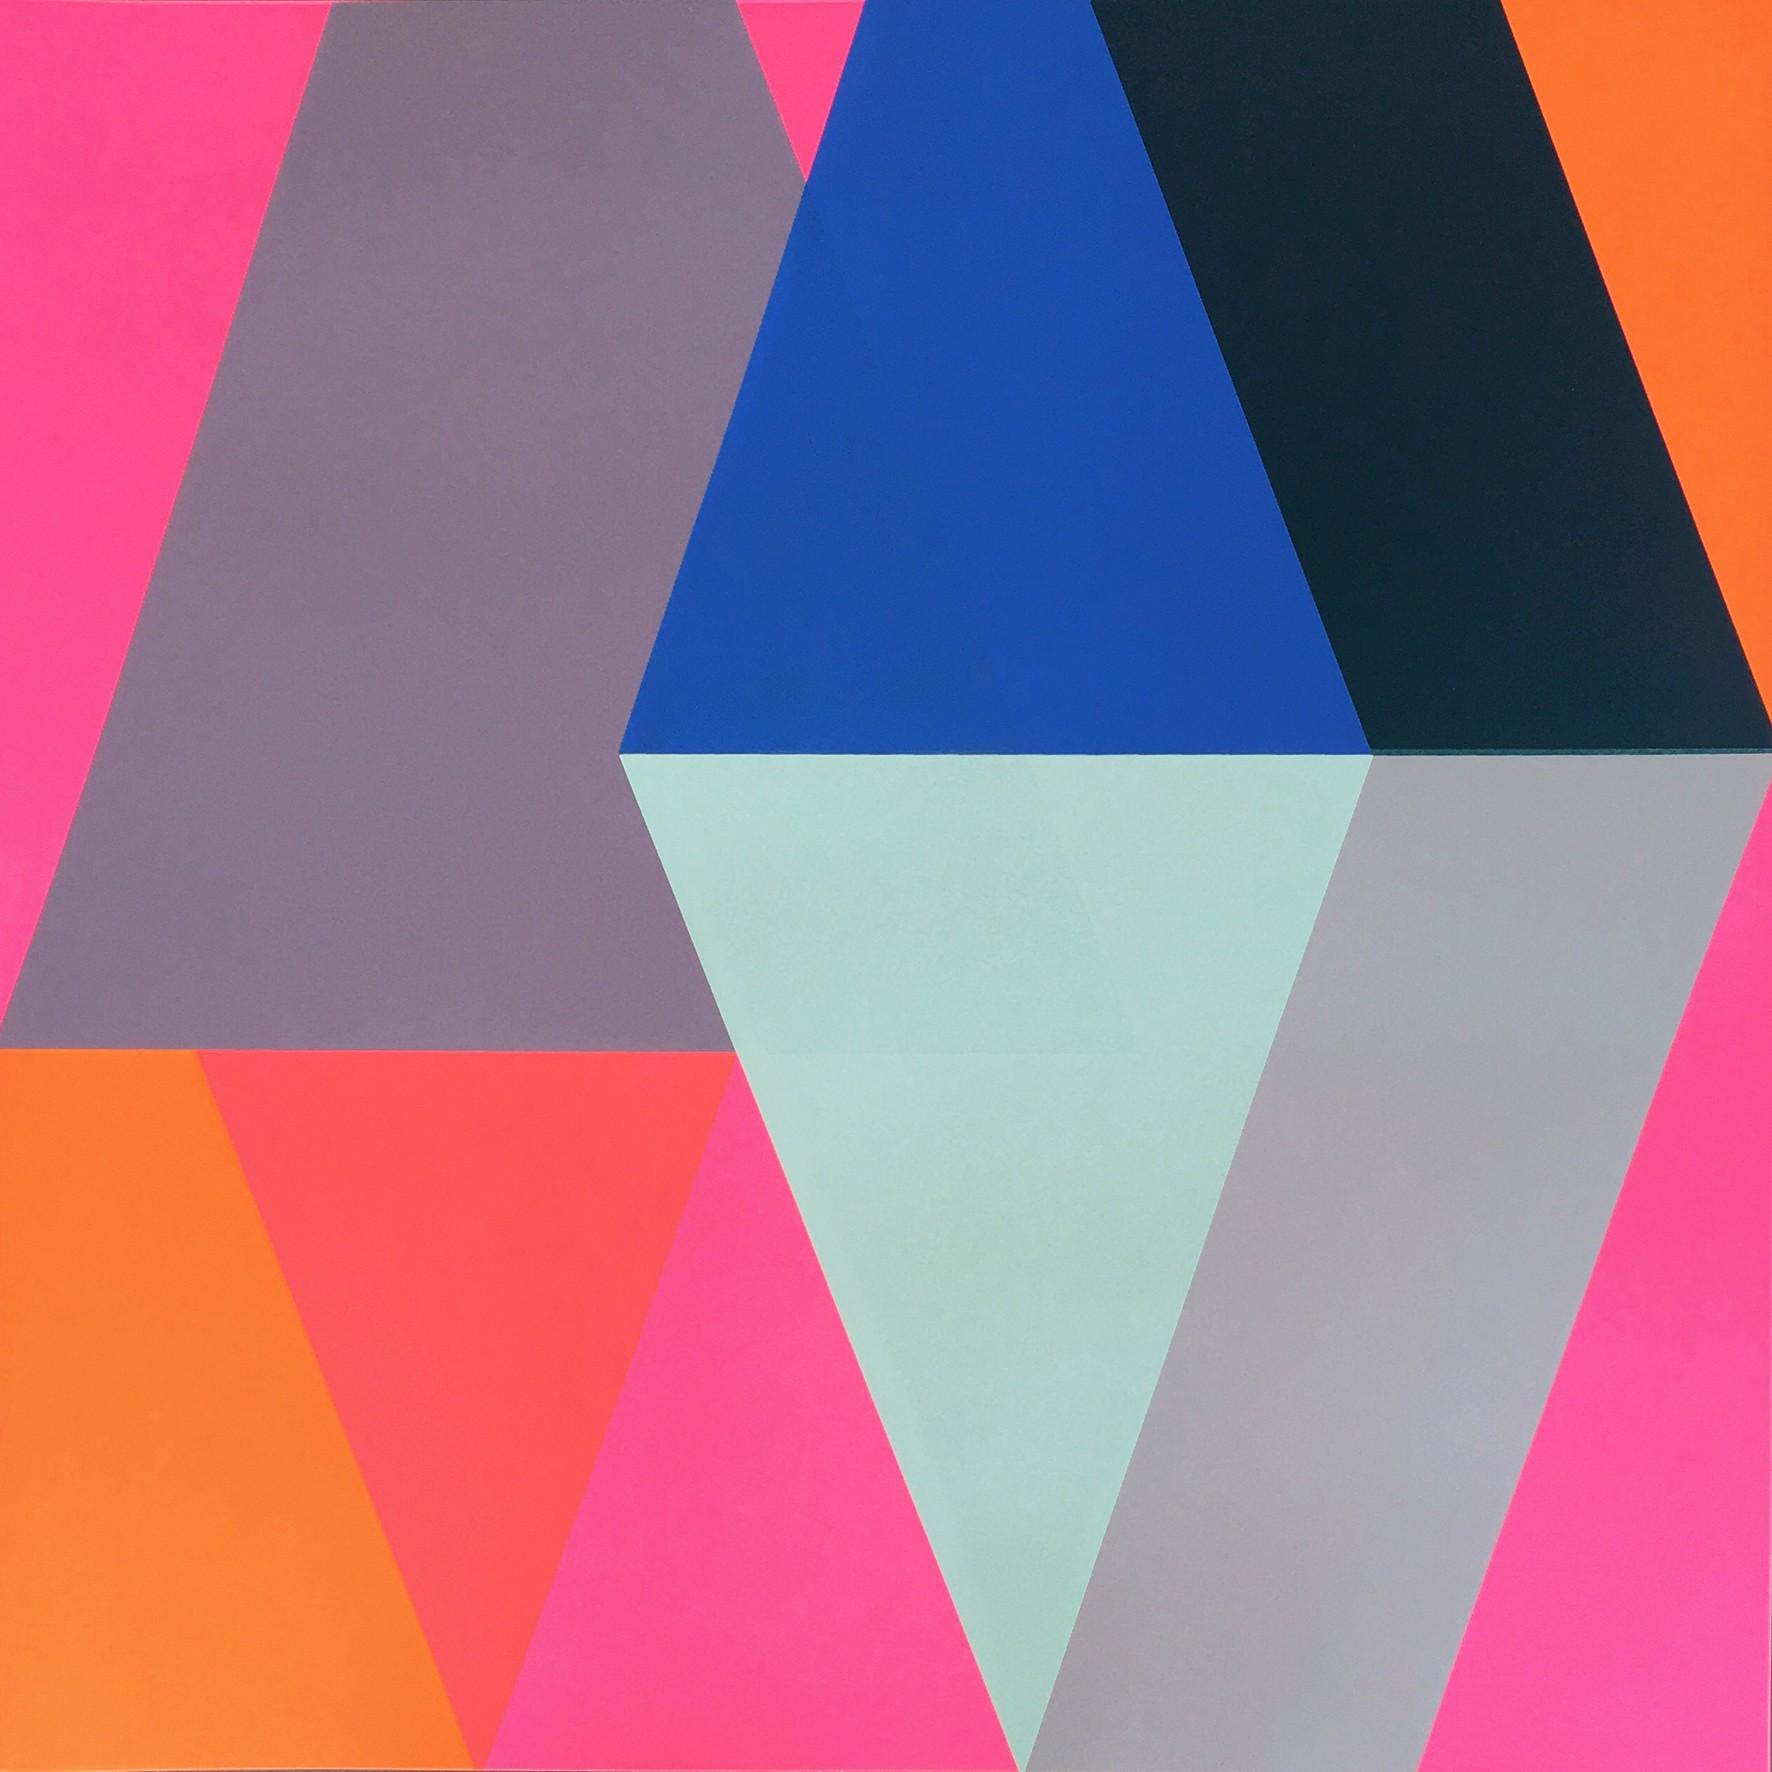 Smithson Gallery_Frea Buckler_Loyal 2_2020_Silkscreen print_60 x 60 cm_£650